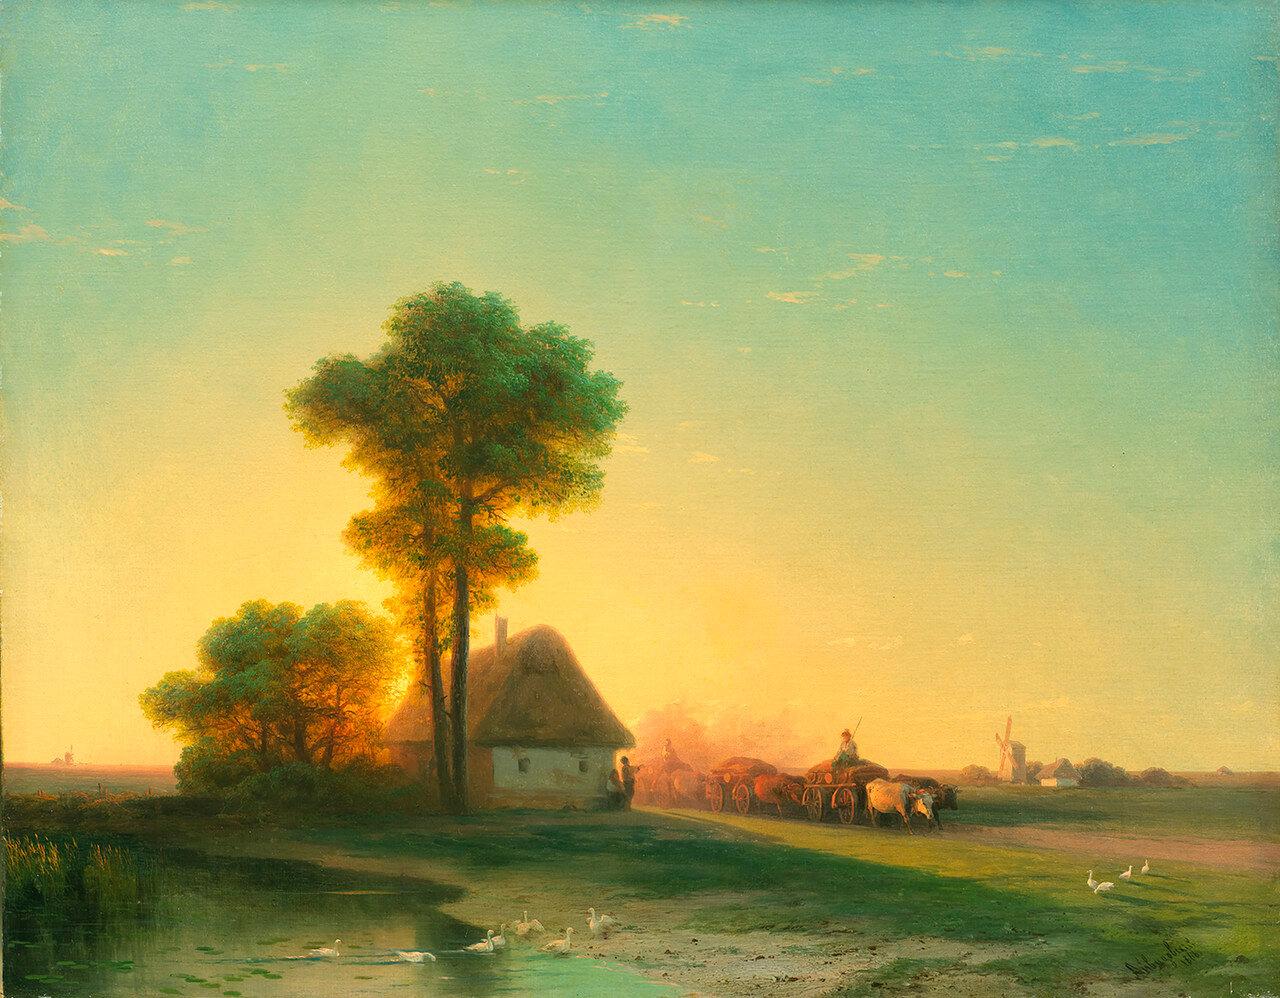 Айвазовский Иван Константинович. «Вечер на Украине». 1866.